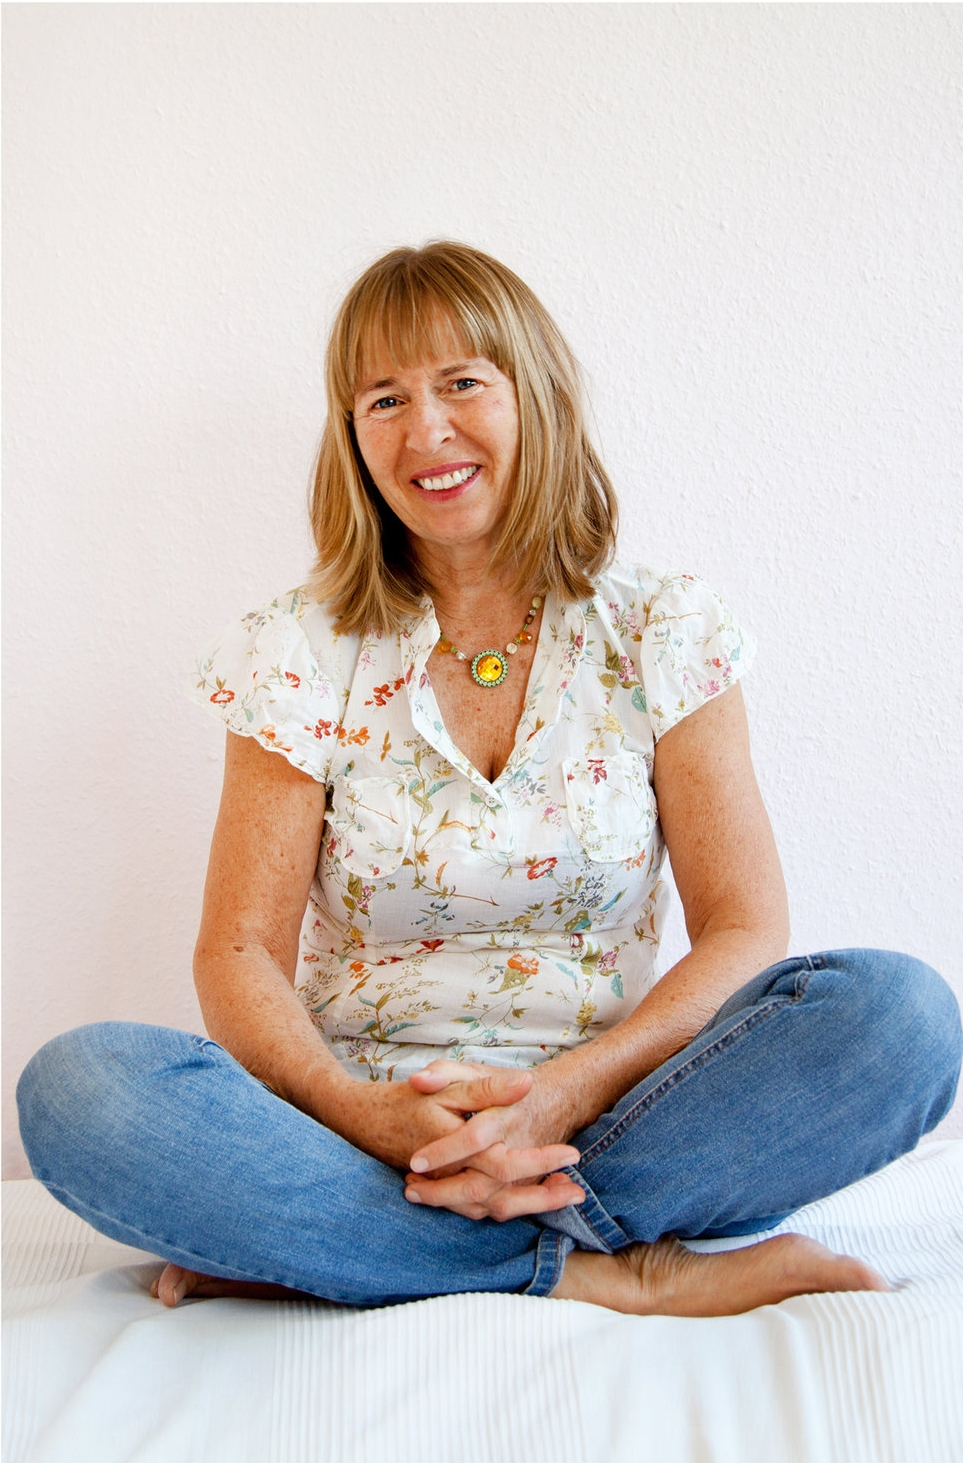 Elke Birkner - Yep, that's my mom double checking for grammar & spelling mistakes whenever she has time. :)